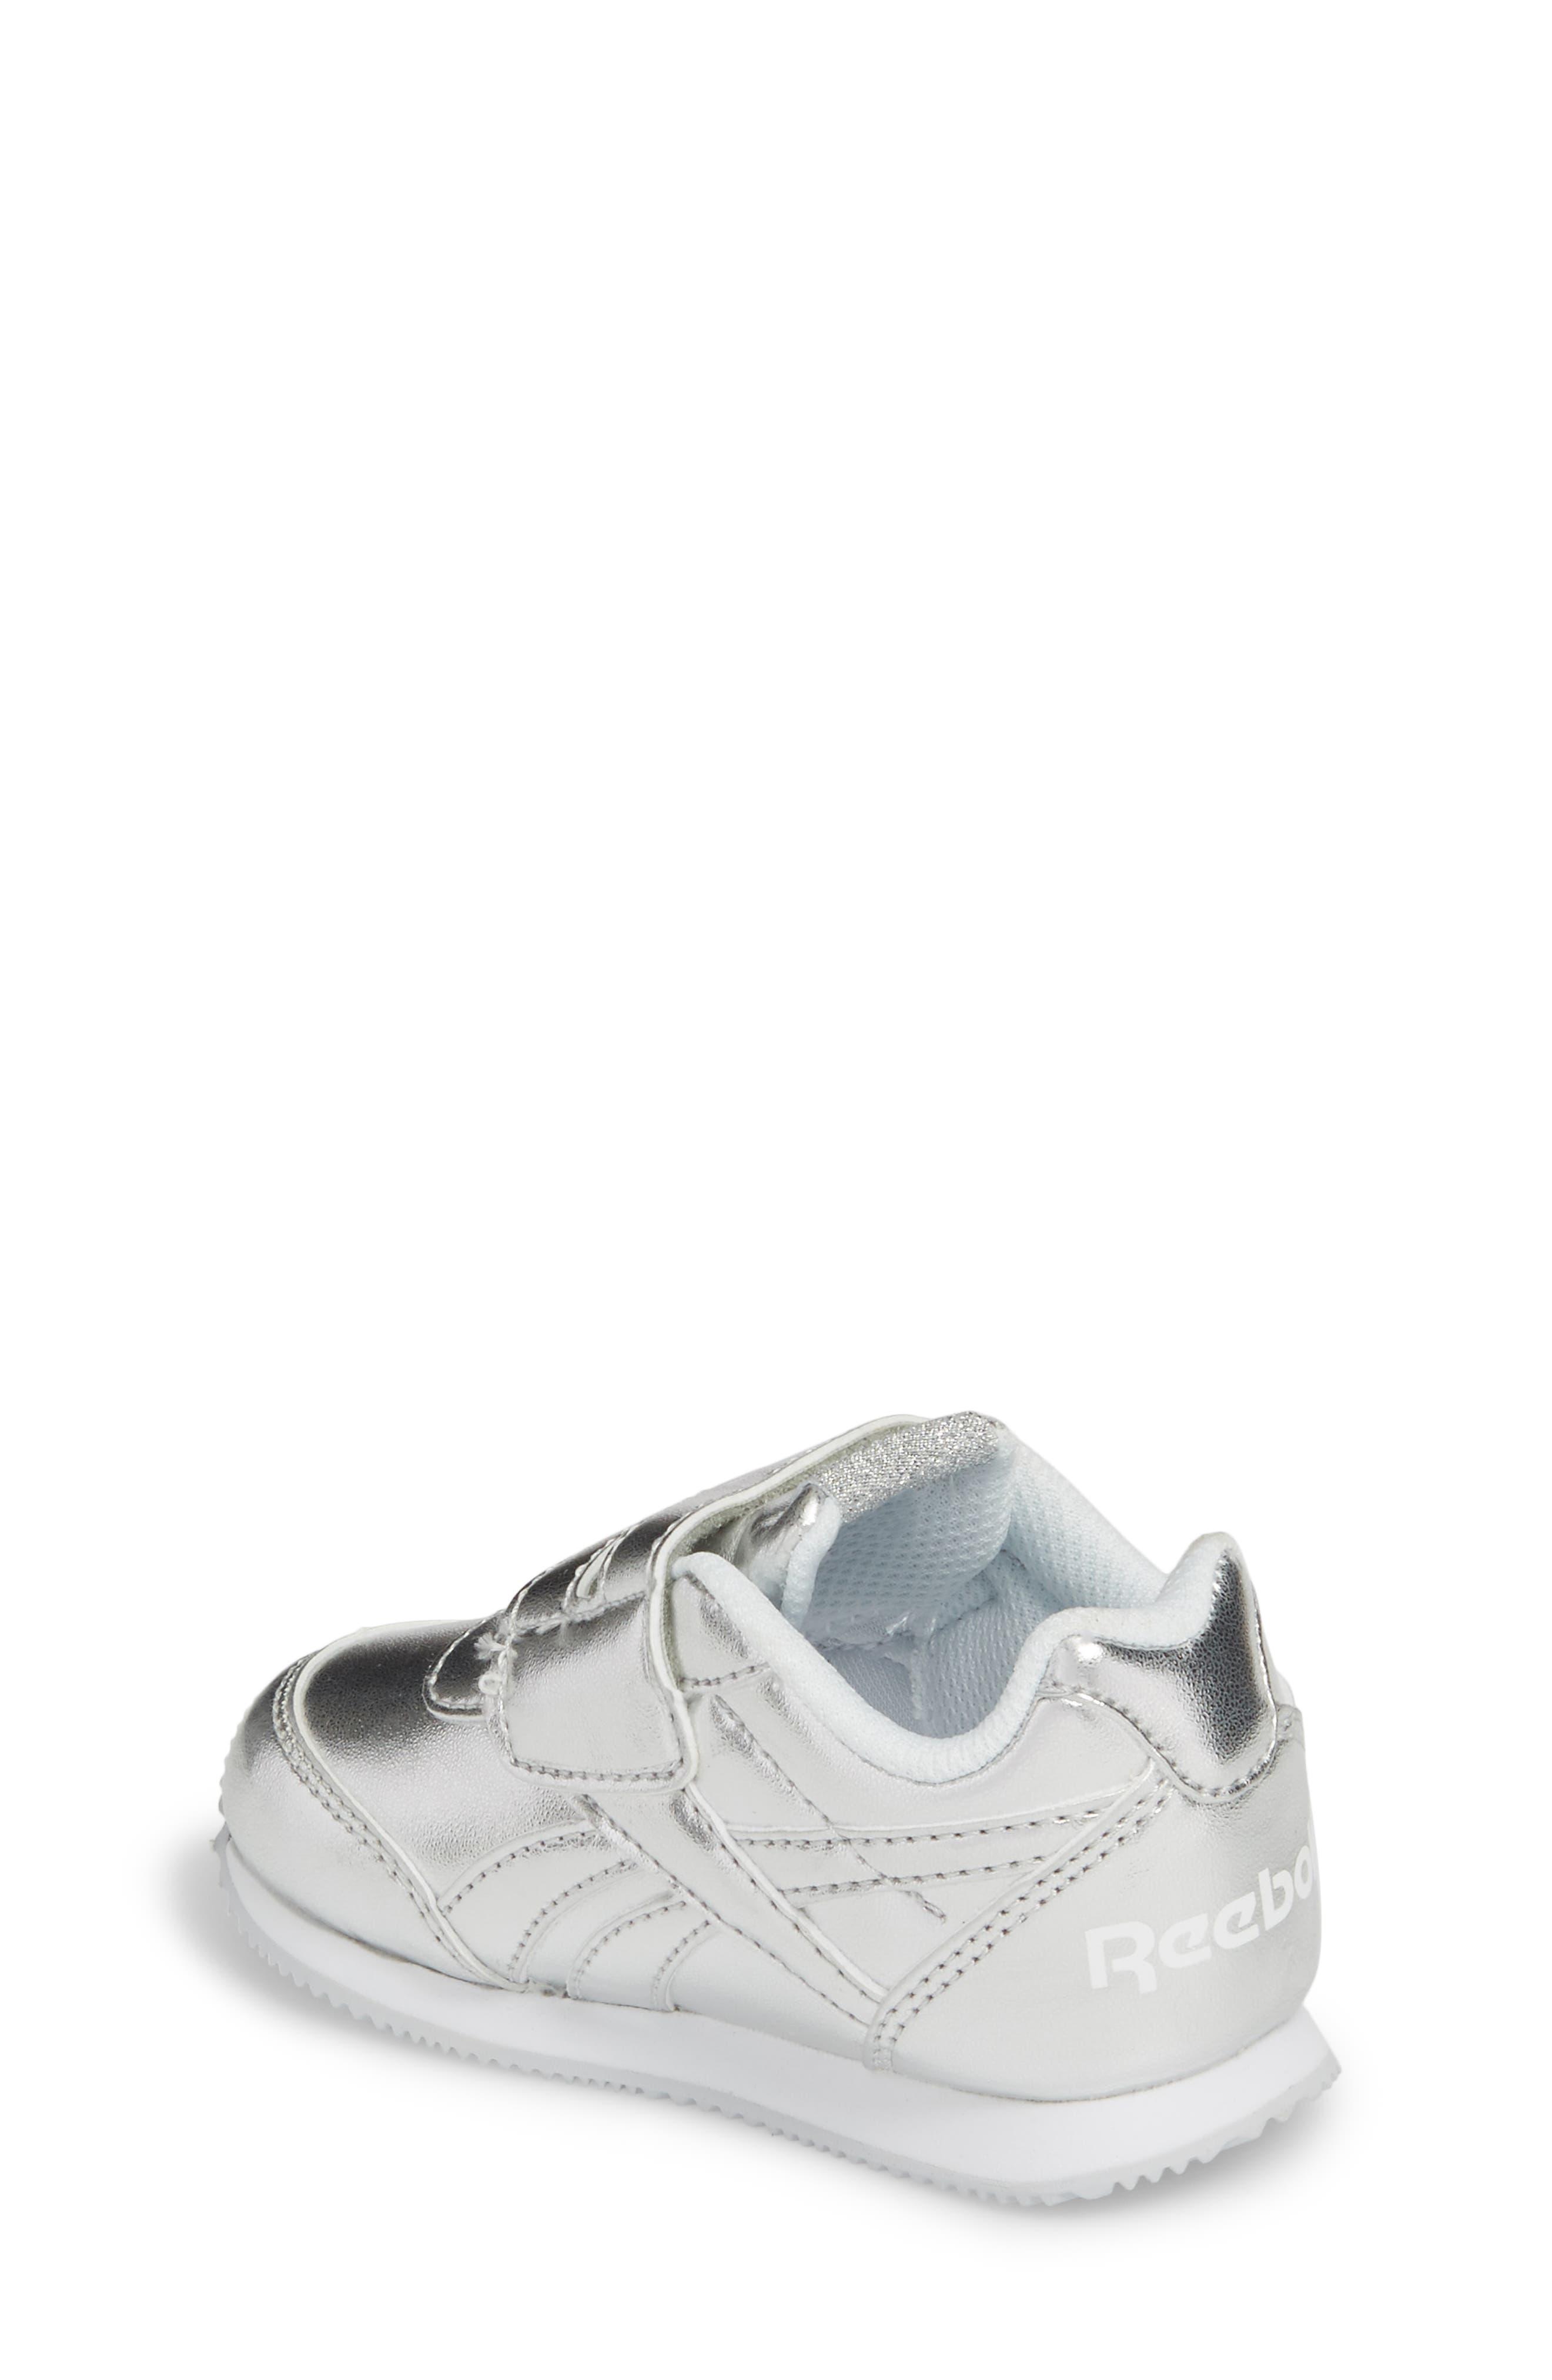 Royal Classic Jogger 2 Sneaker,                             Alternate thumbnail 2, color,                             040